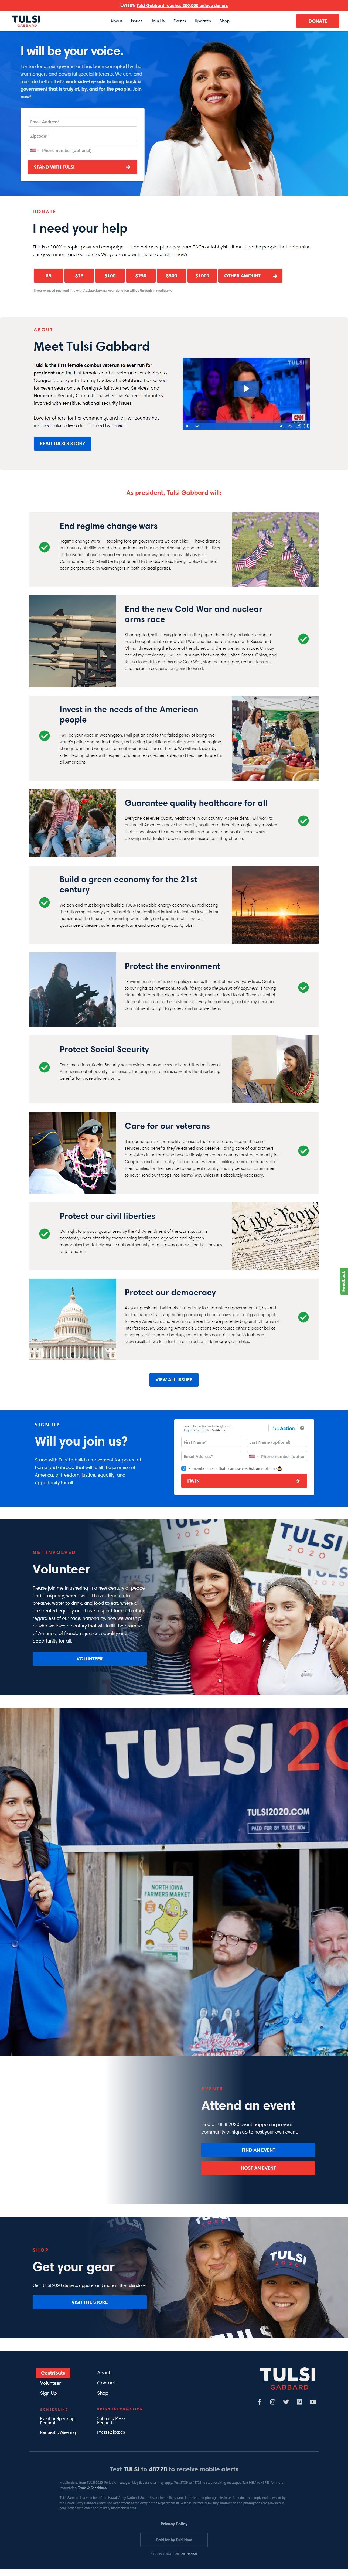 Homepage Snapshot for December 1, 2019: Representative Tulsi Gabbard